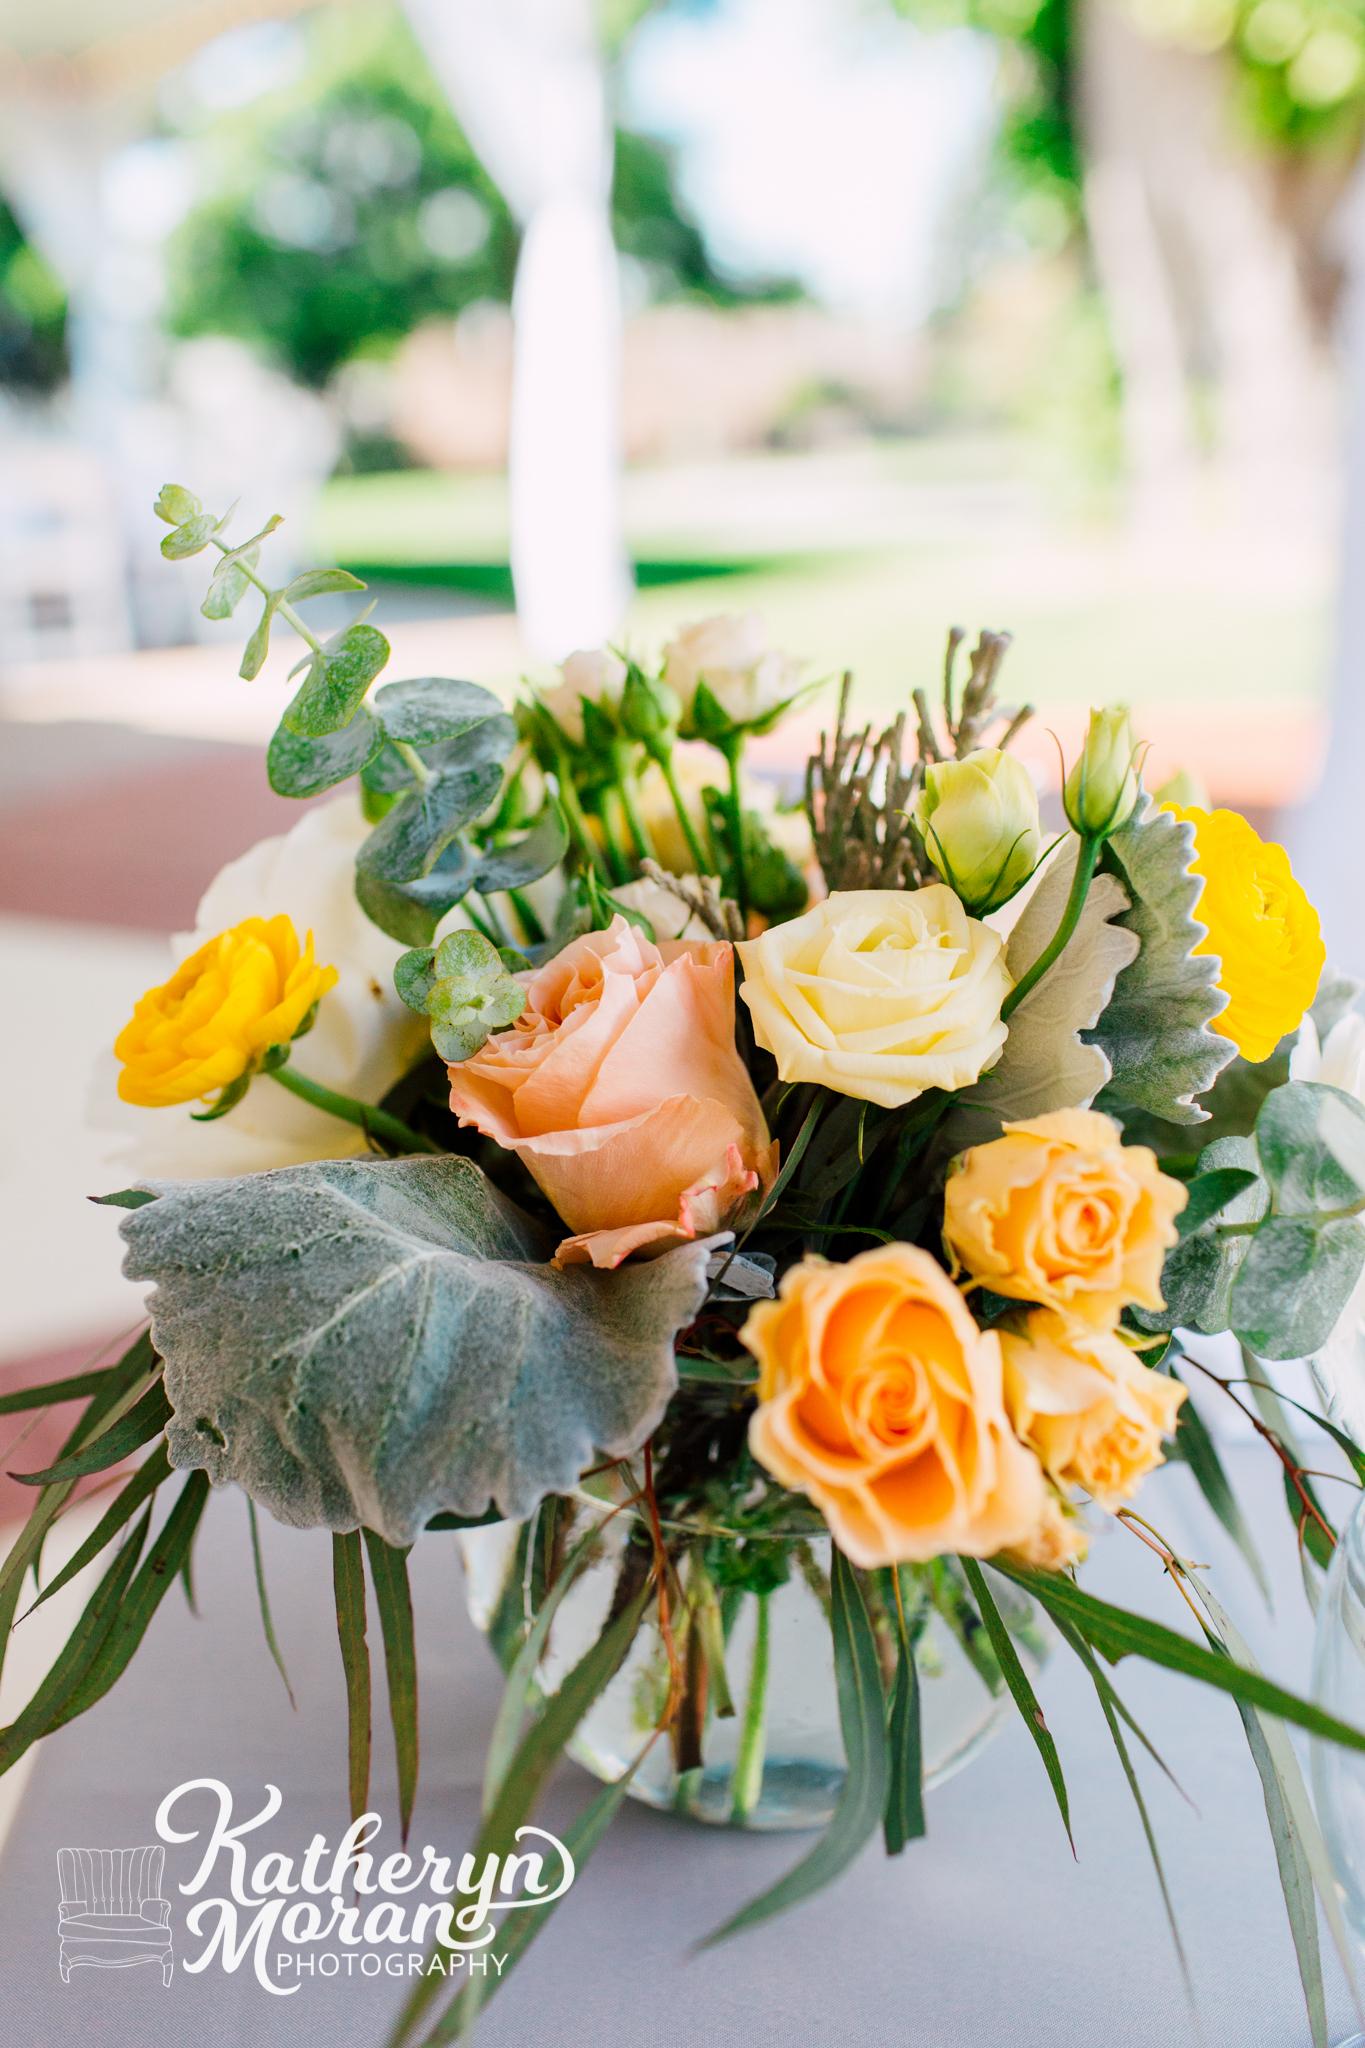 bellingham-wedding-photographer-lairmont-manor-katheryn-moran-17.jpg